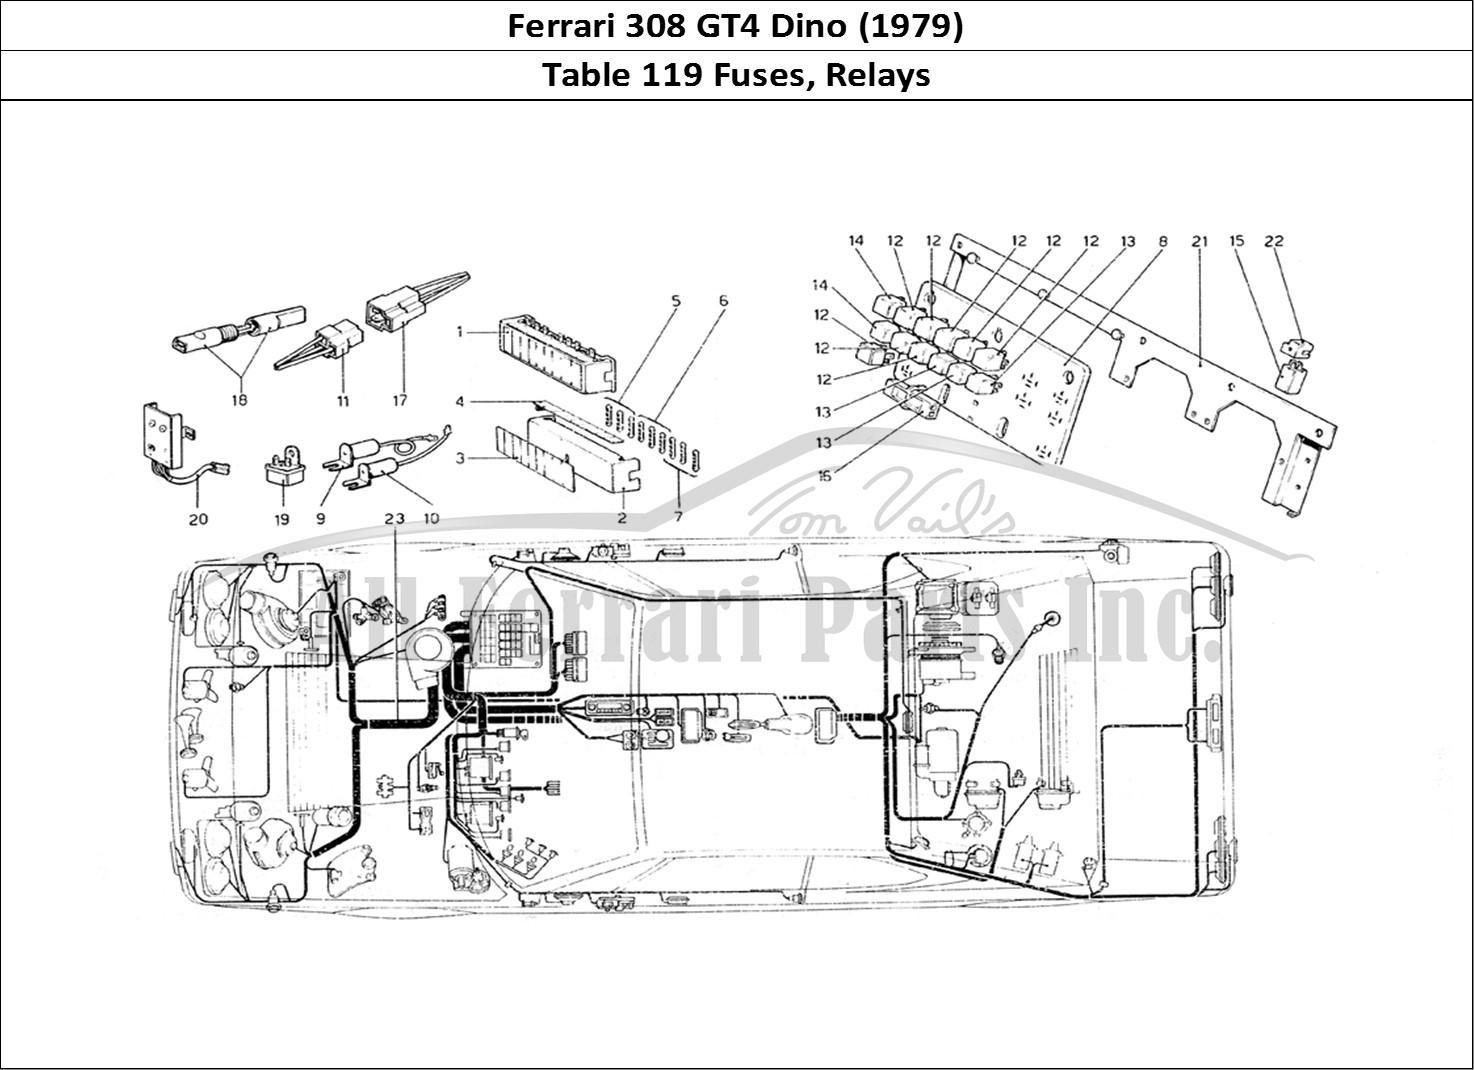 Buy original Ferrari 308 GT4 Dino (1979) 119 Fuses, Relays